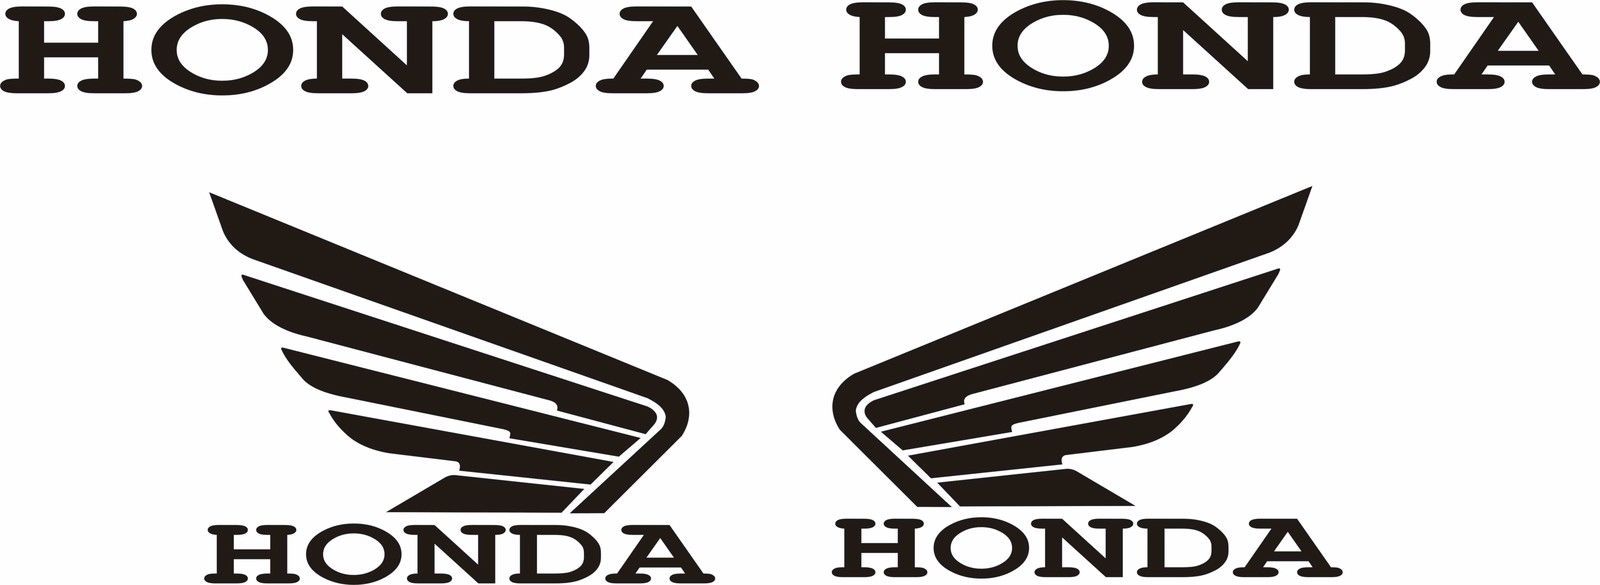 honda wing logos. Black Bedroom Furniture Sets. Home Design Ideas